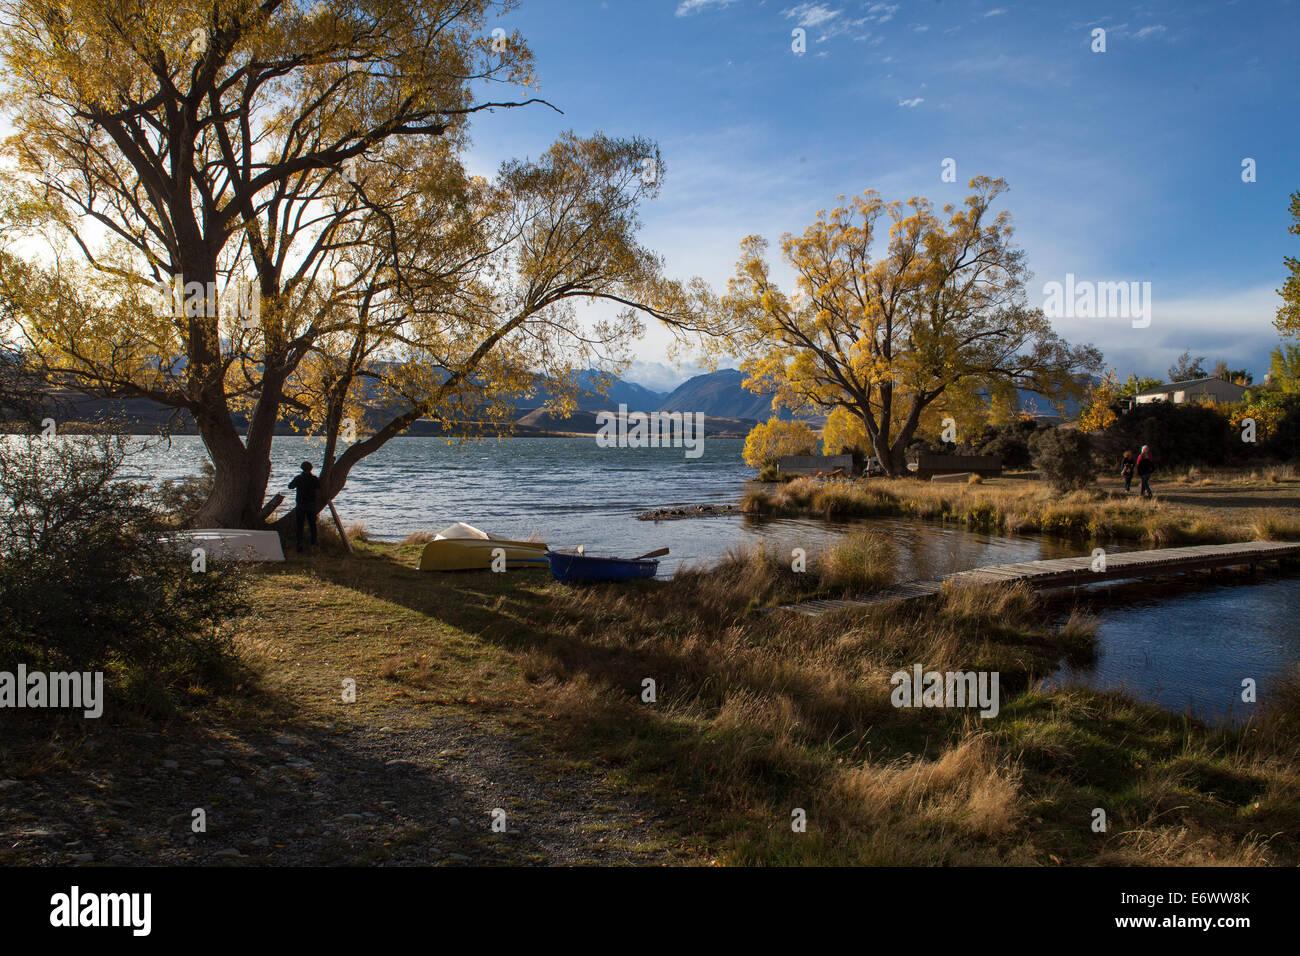 Autumn at Lake Alexandrina with rowing boats along the shore, Wildlife Refuge, Canterbury, South Island, New Zealand - Stock Image